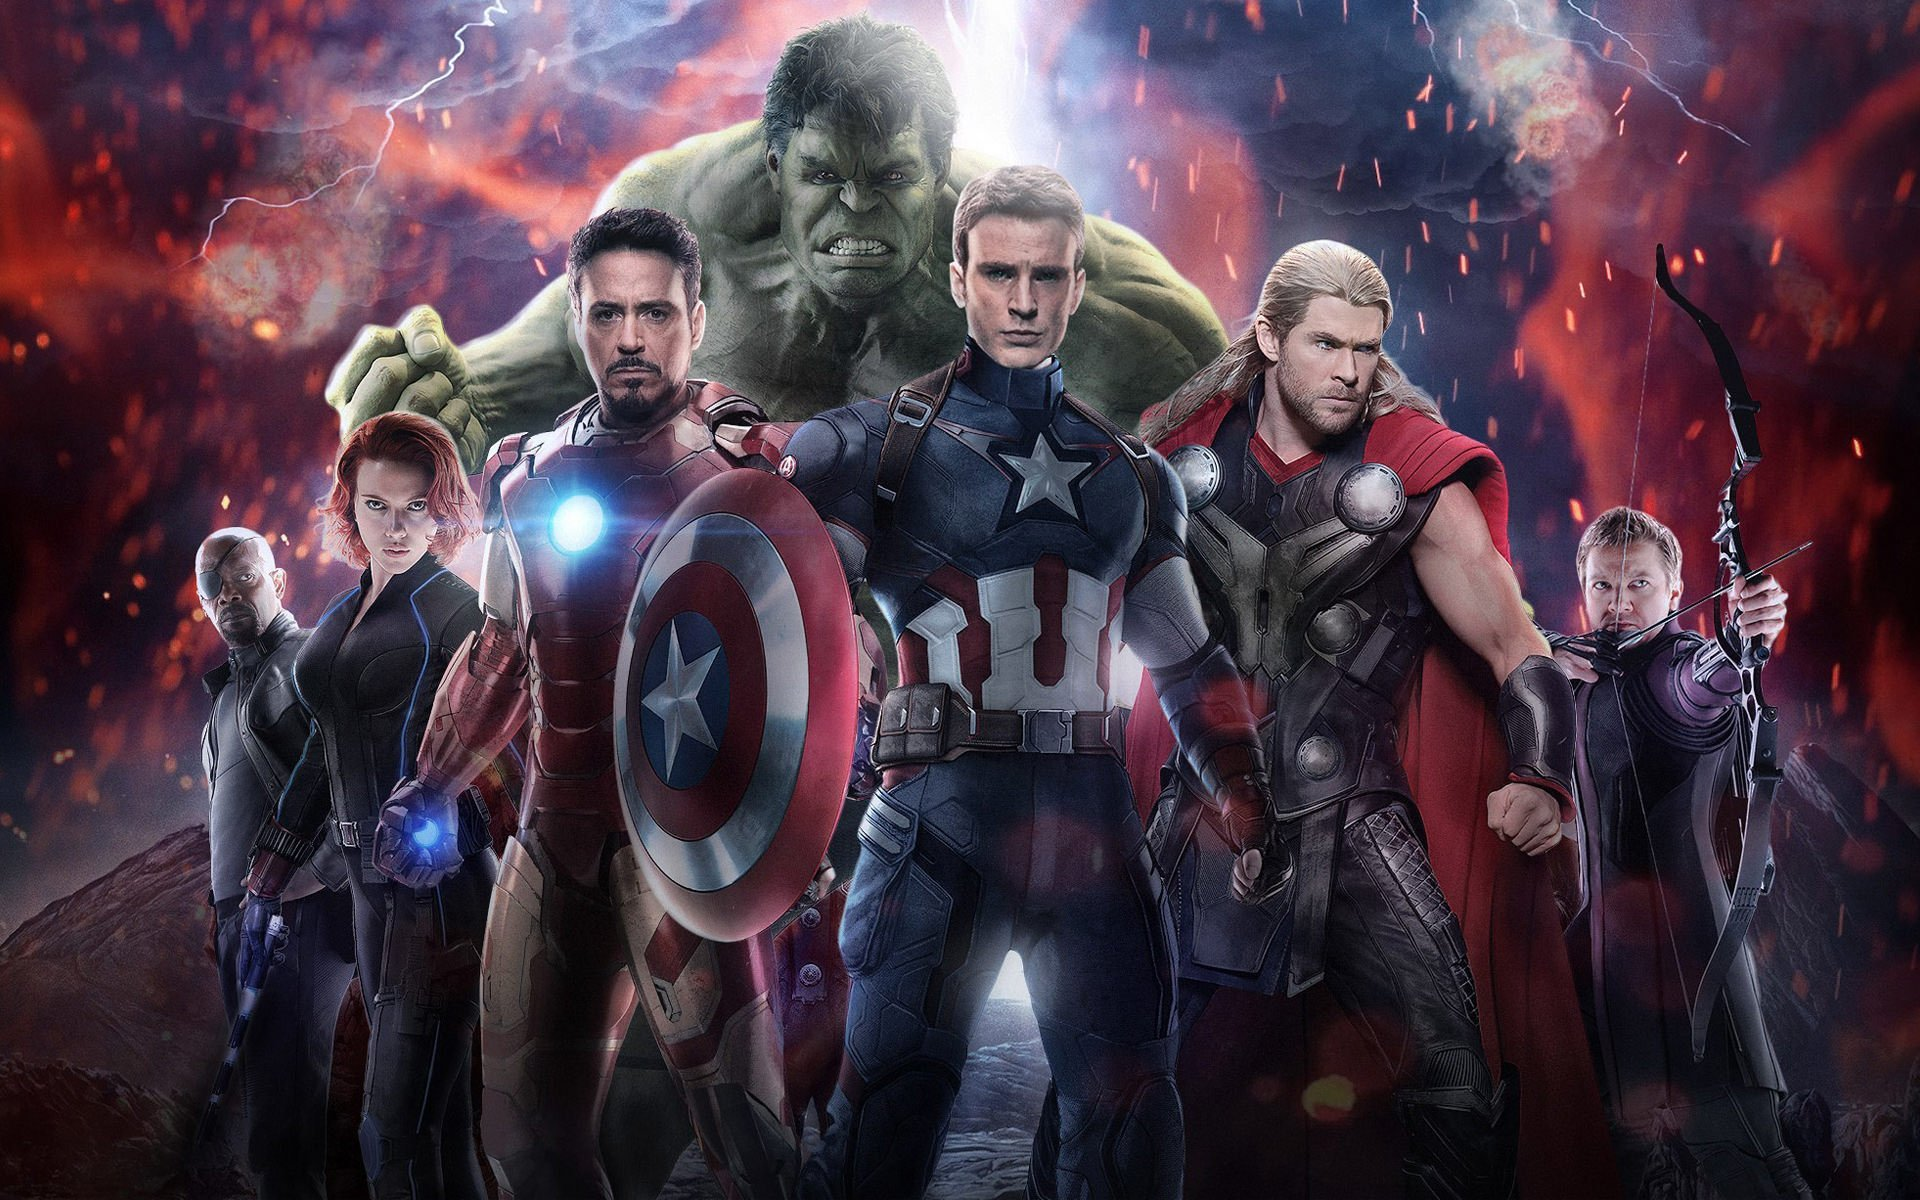 15 Best HD Superhero Movie WallpapersFreeCreatives 1920x1200